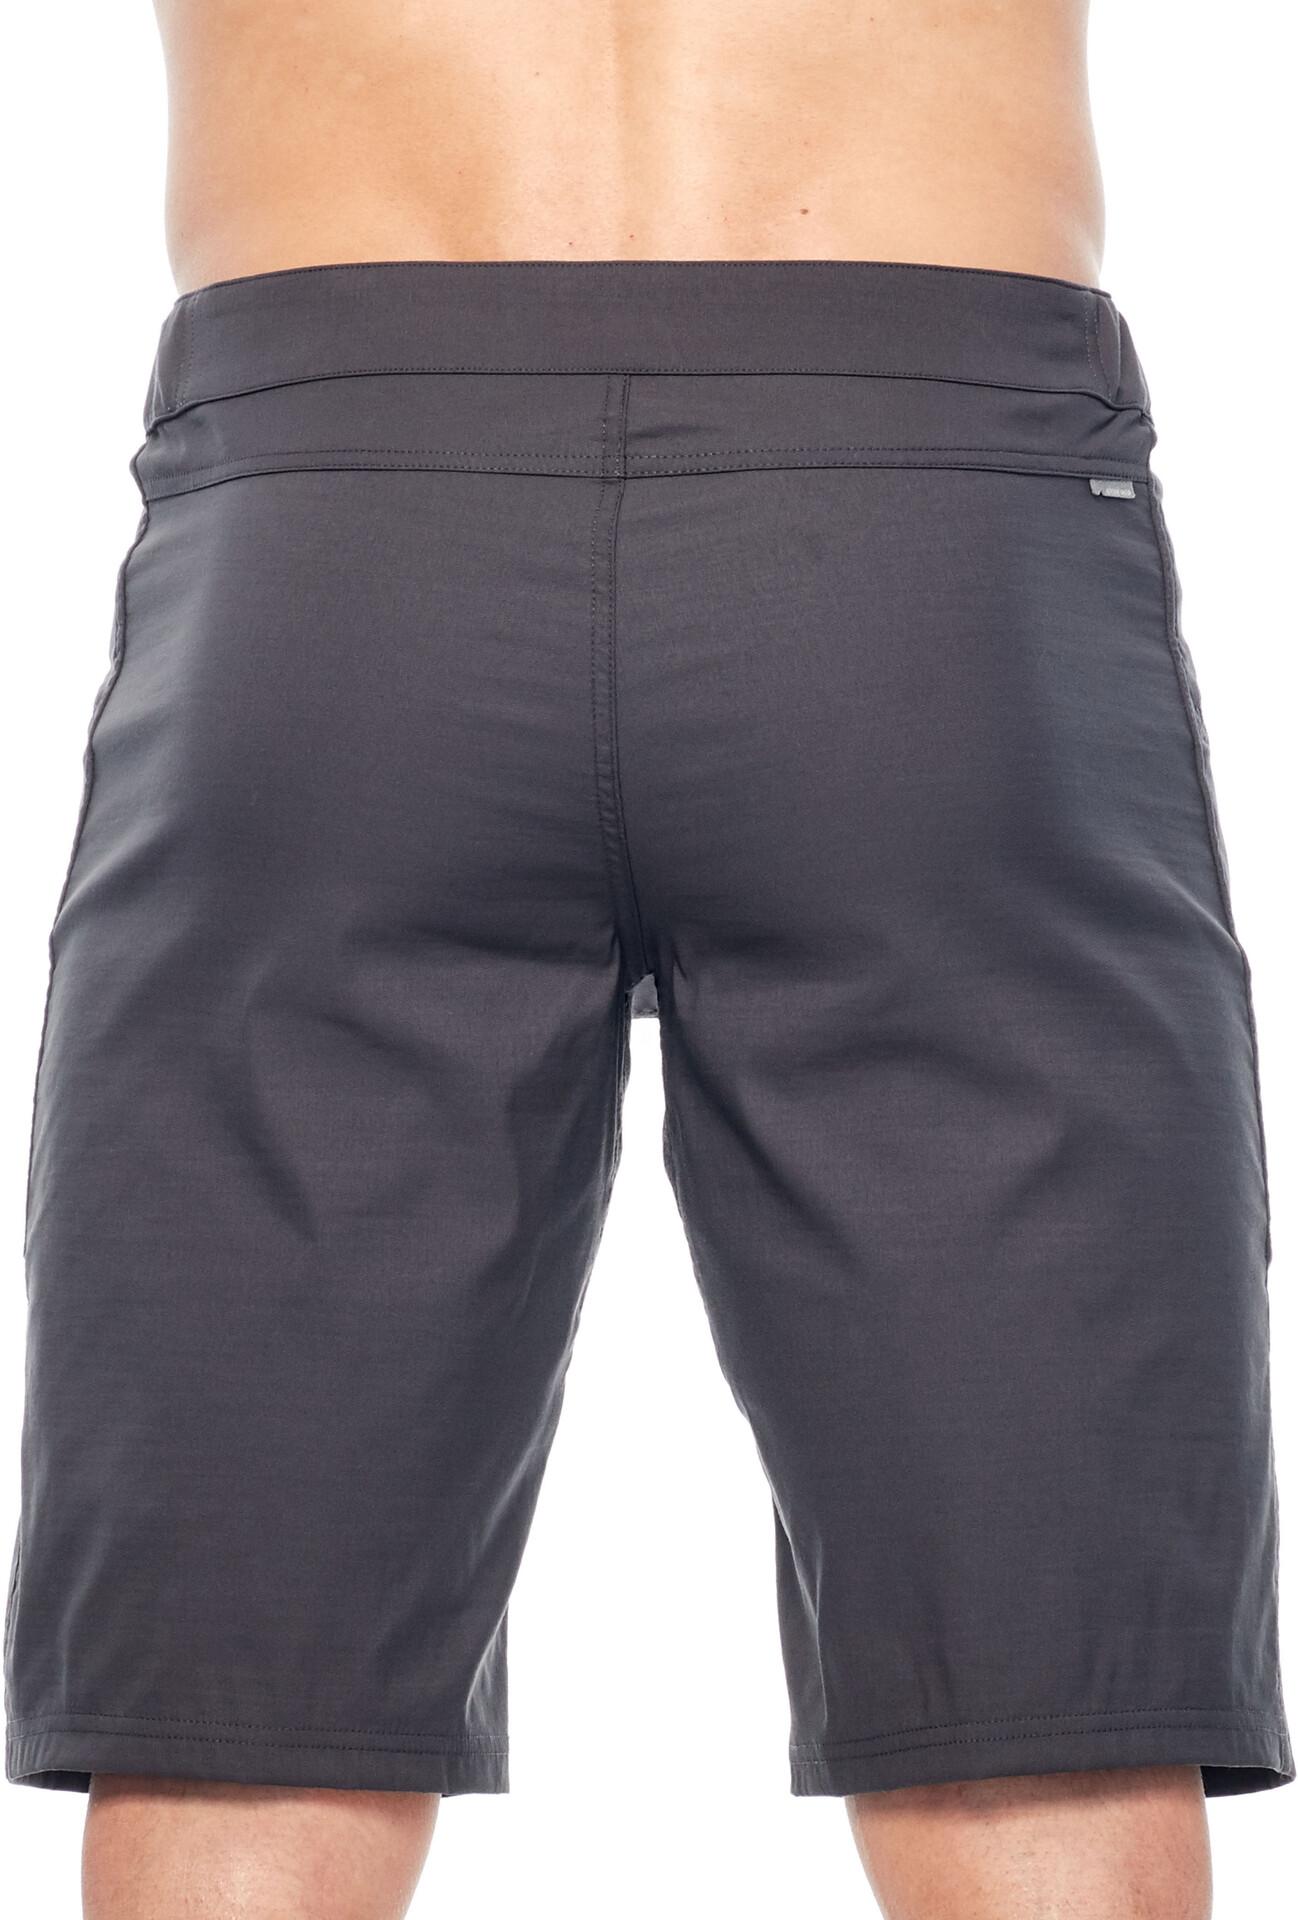 Icebreaker M's Persist Shorts Shorts Shorts monsoon (2019) 287b5d